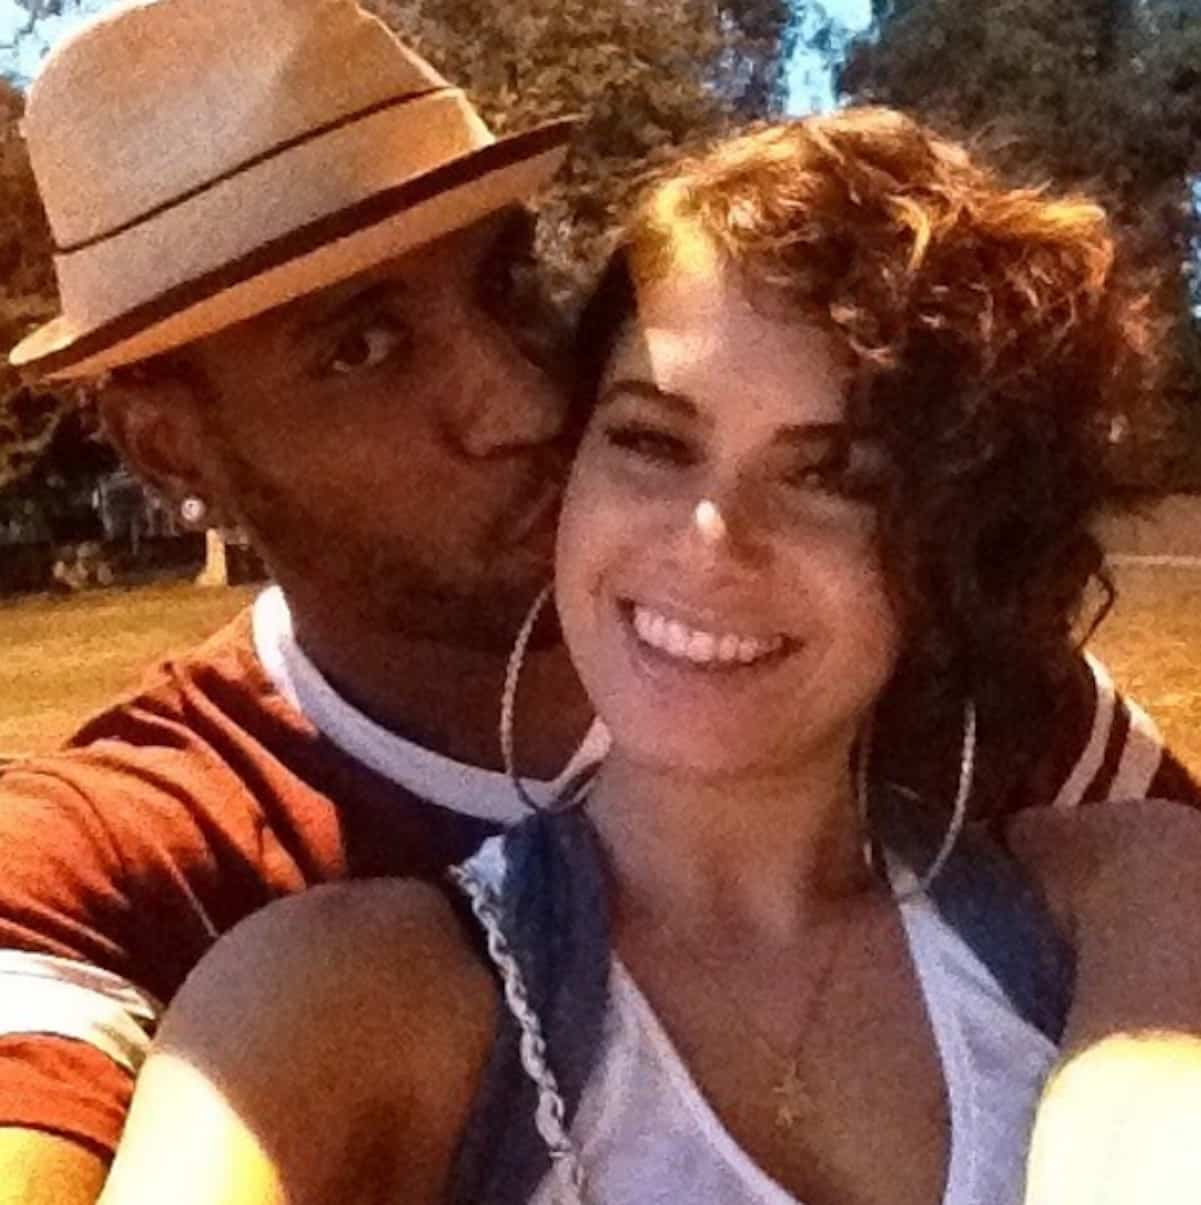 rasual butler wife leah killed car accident